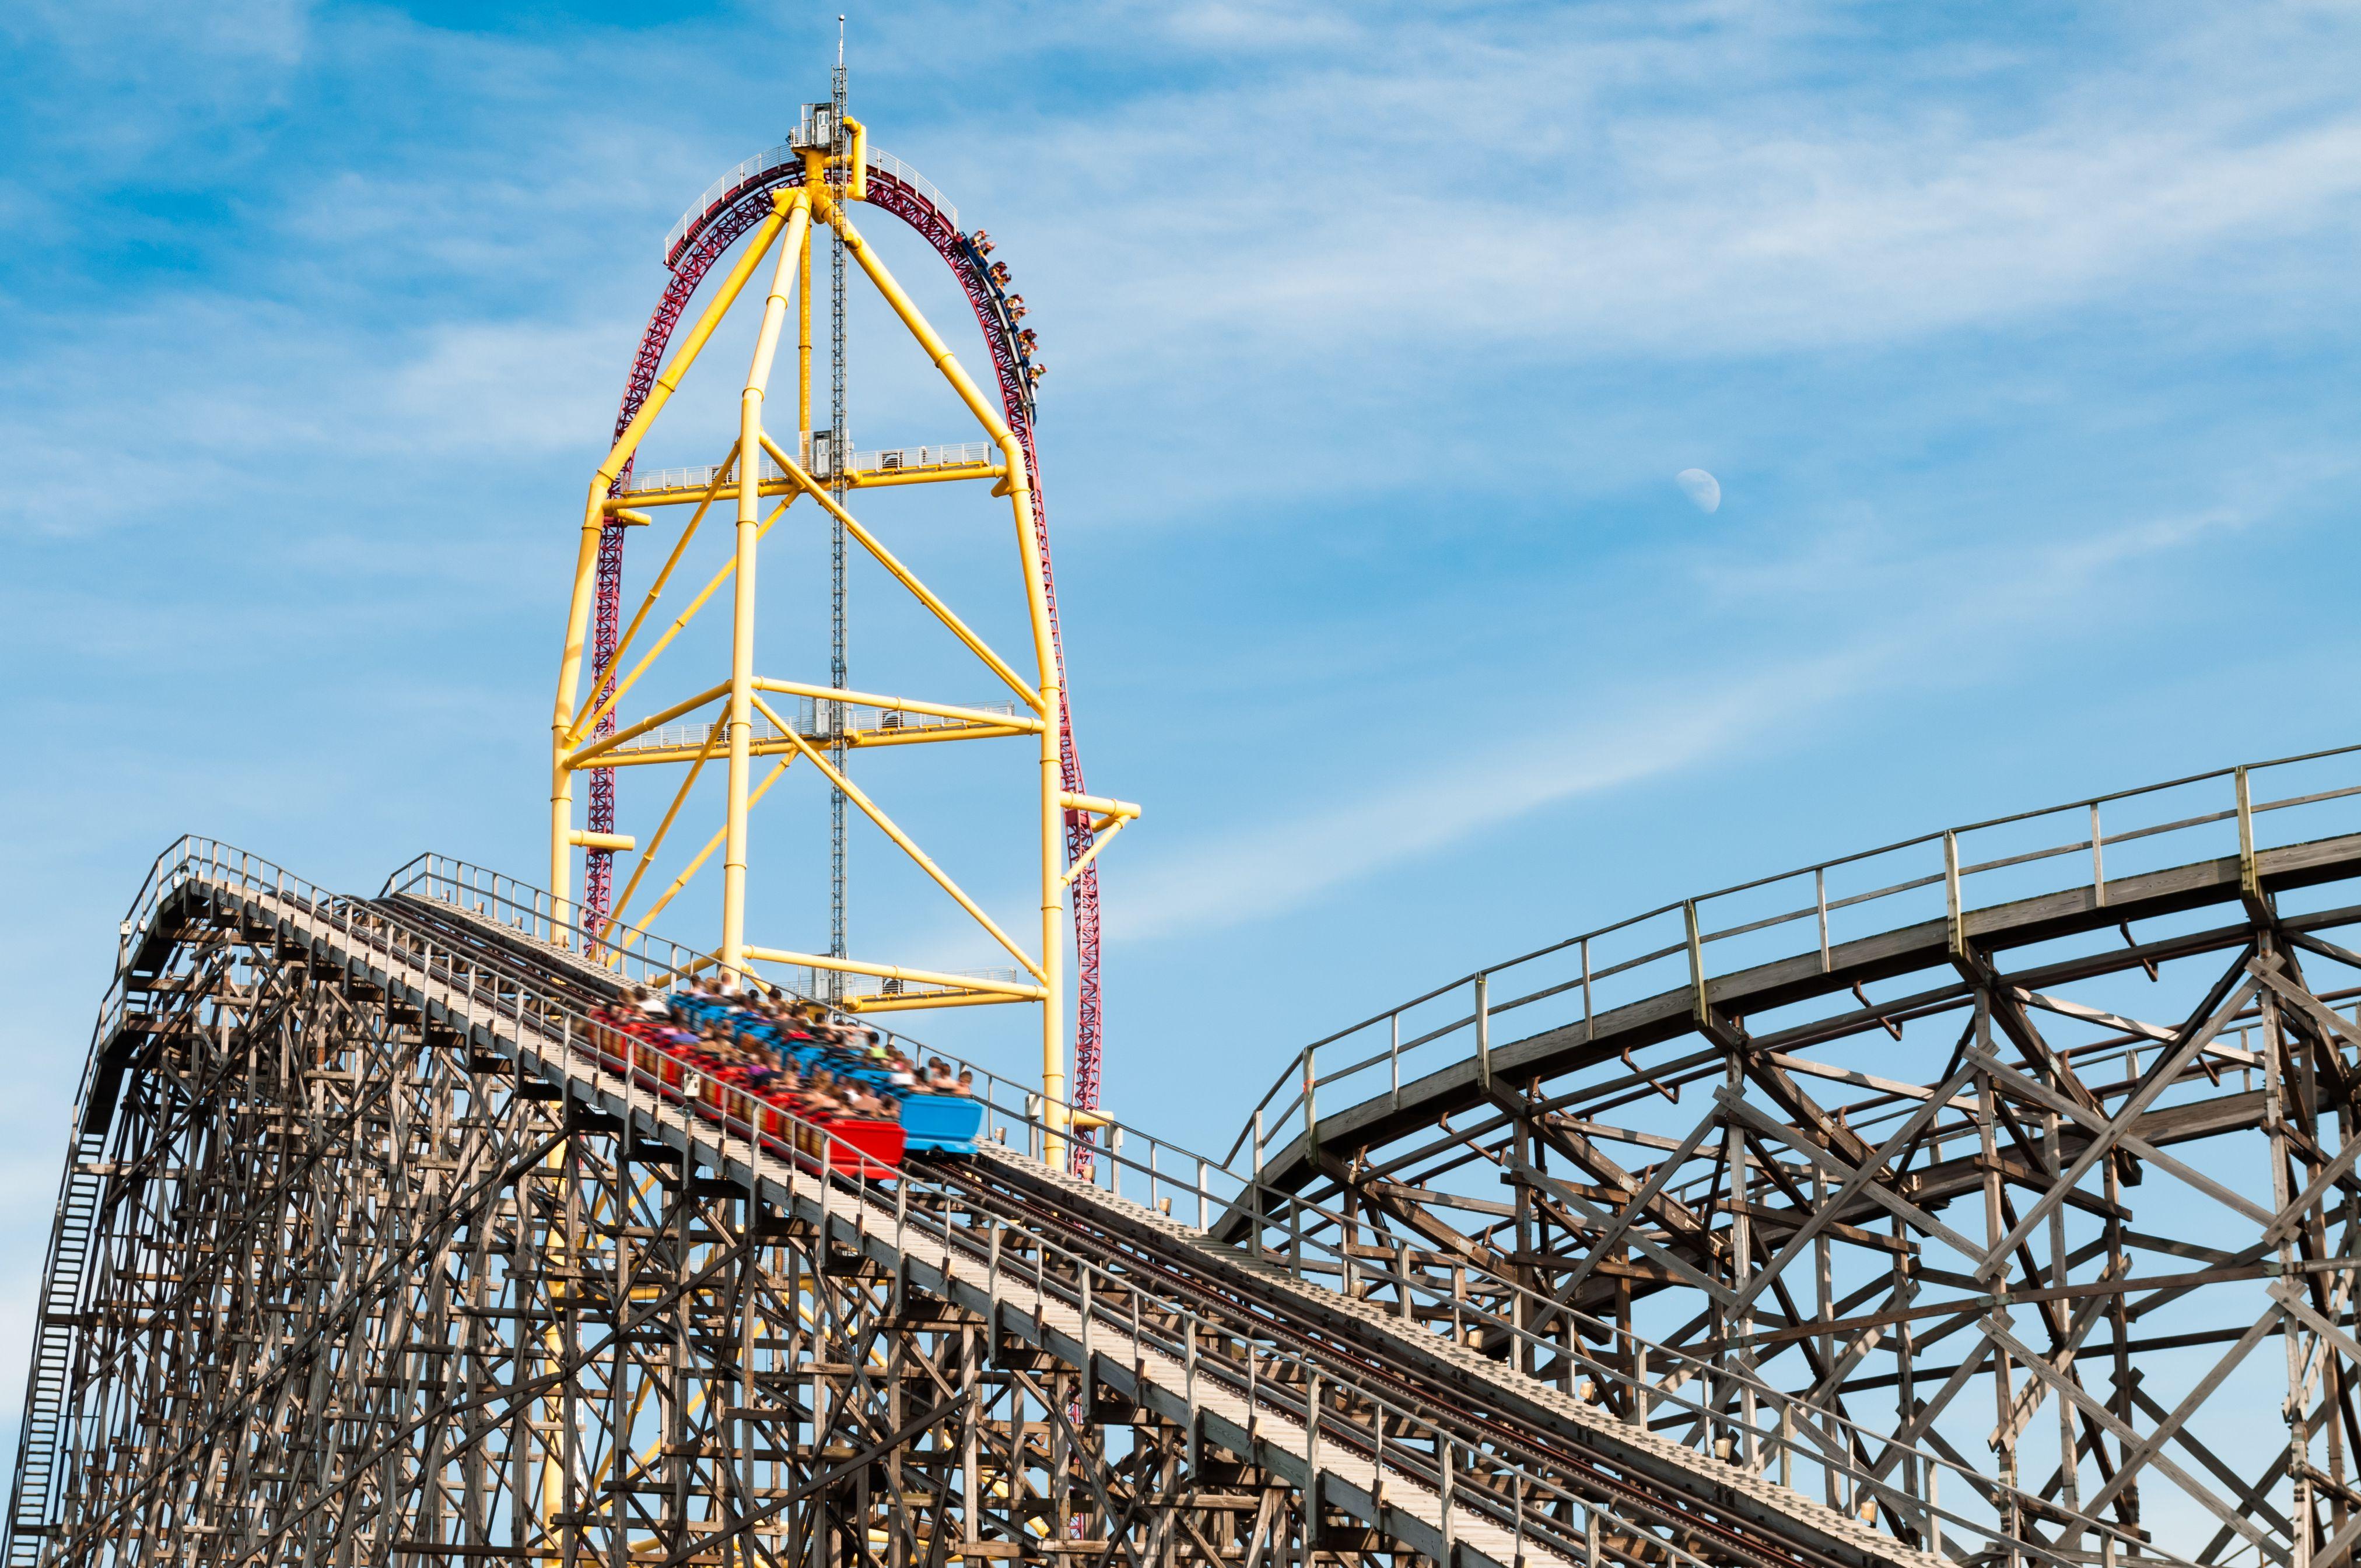 Roller coaster rides at an amusement park